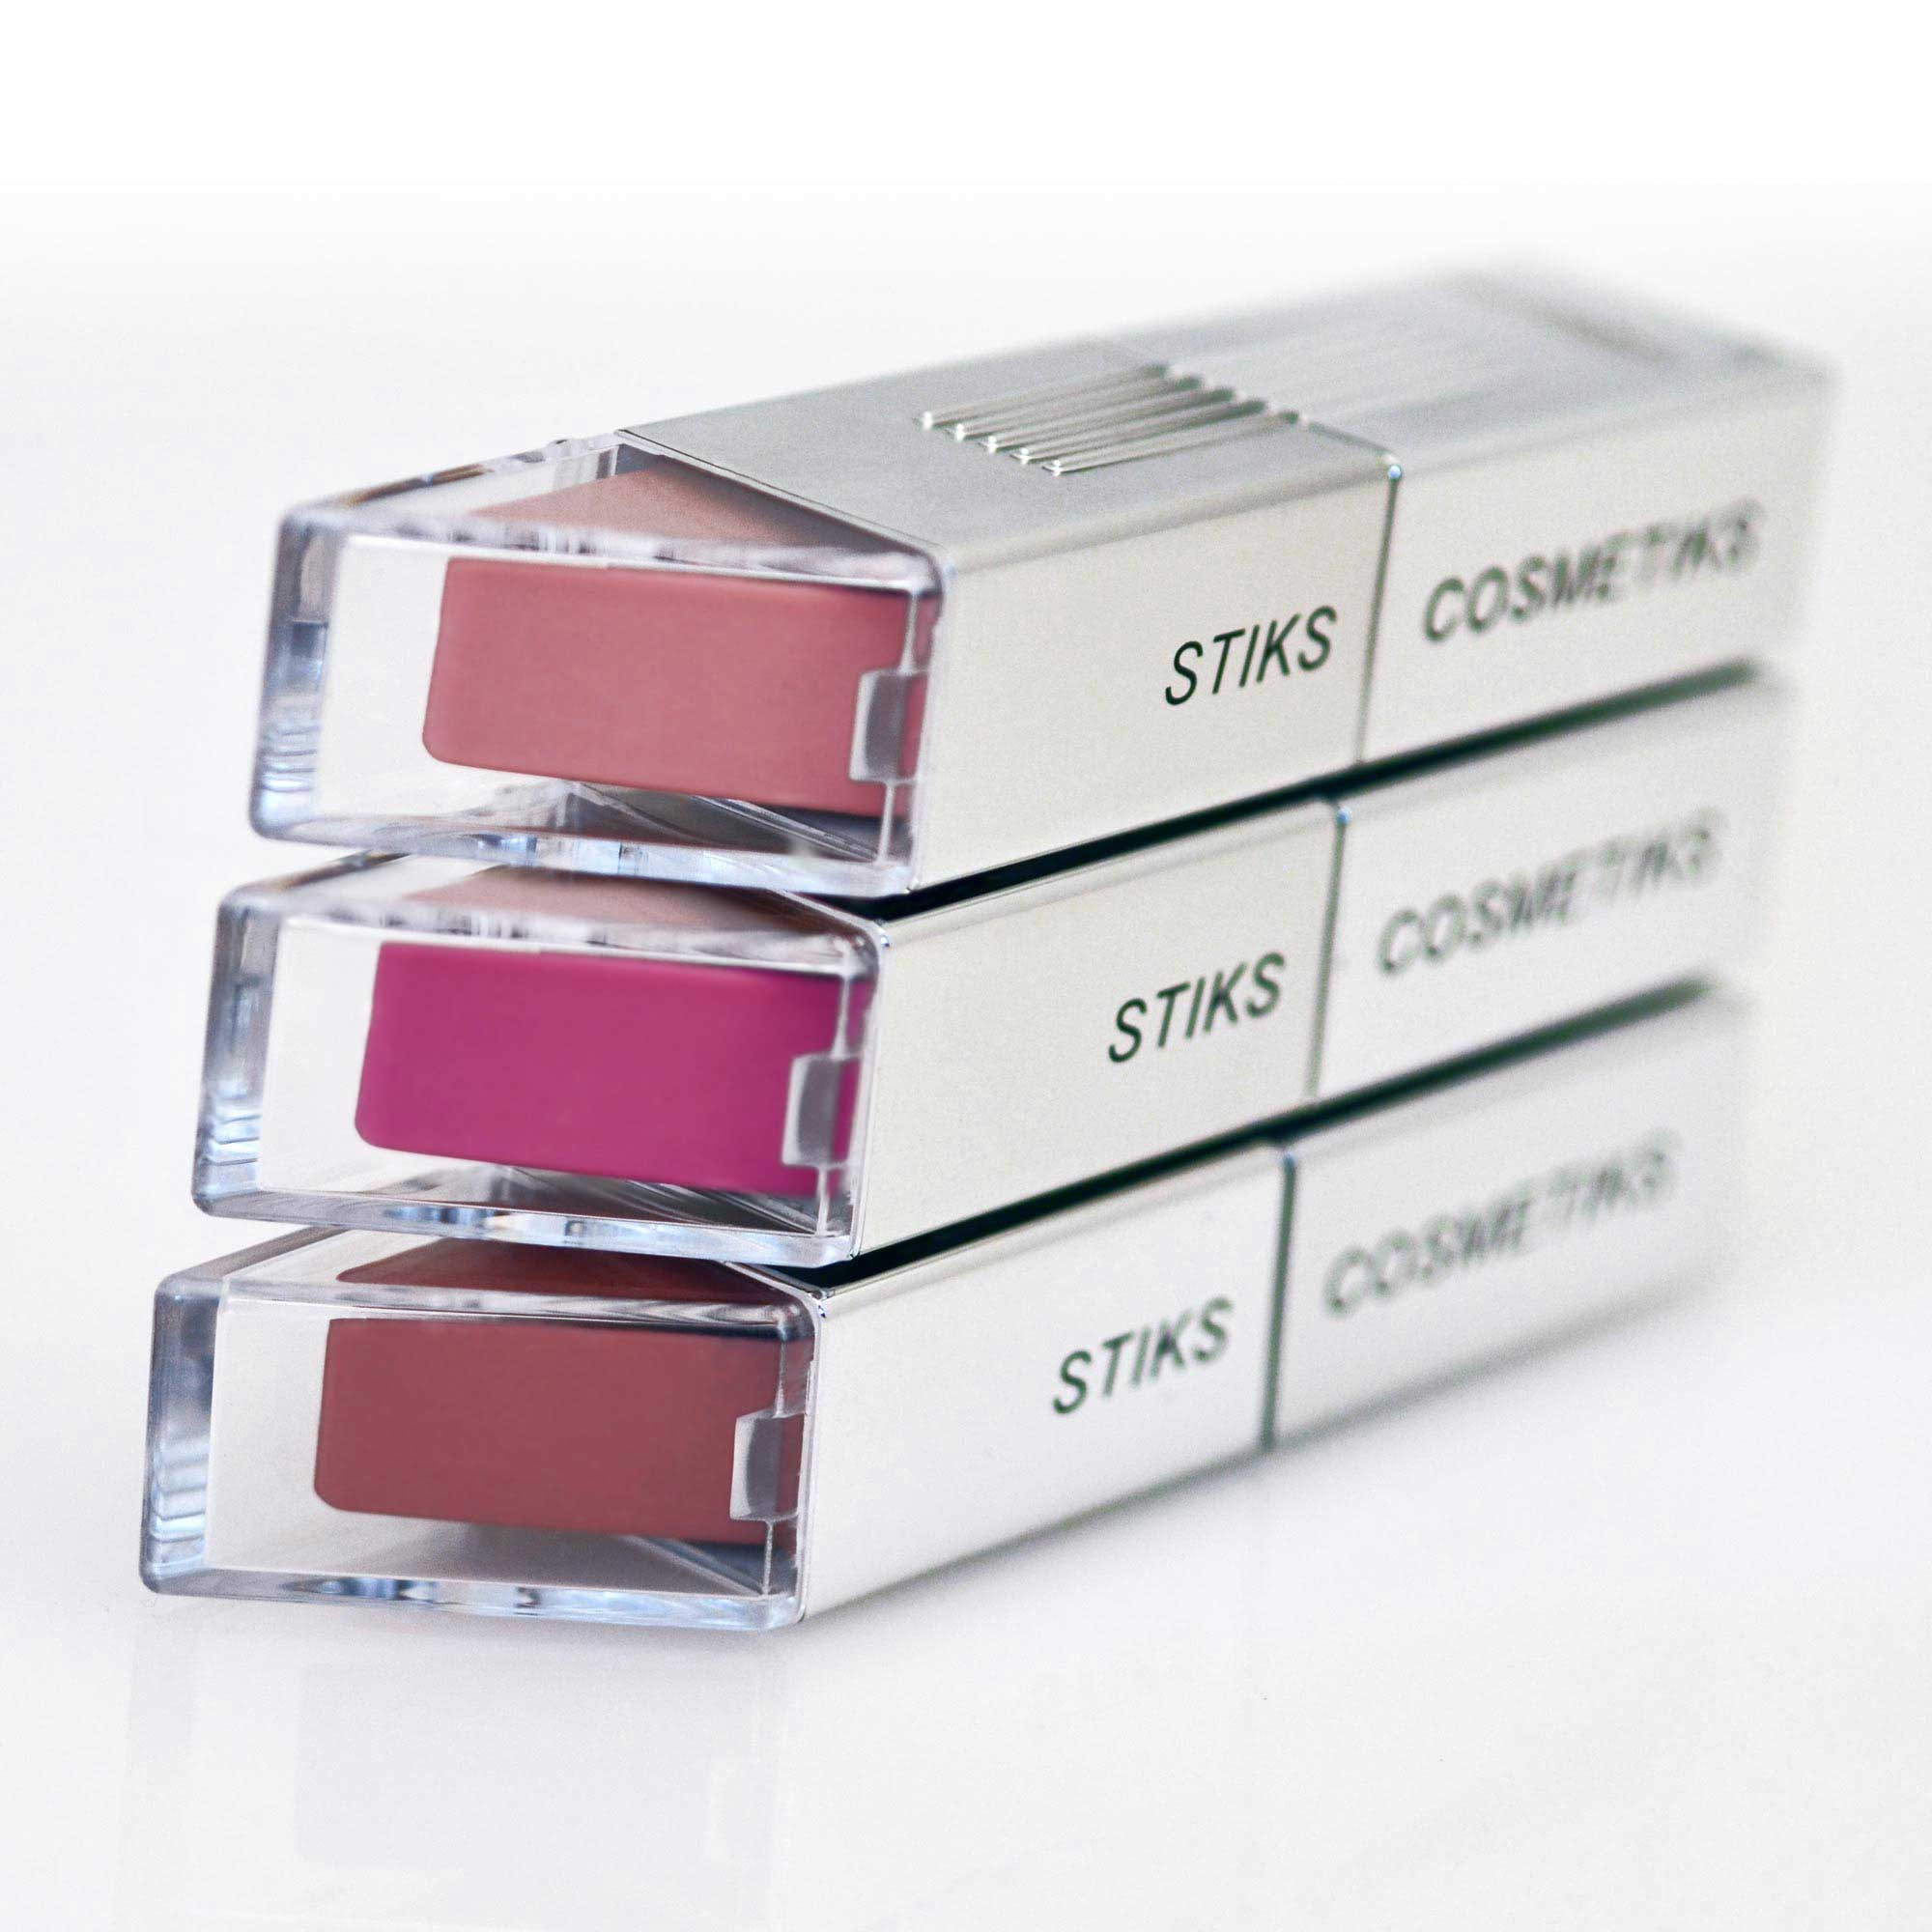 Stiks Cosmetiks ' Think Pink! Sliks  ($38)